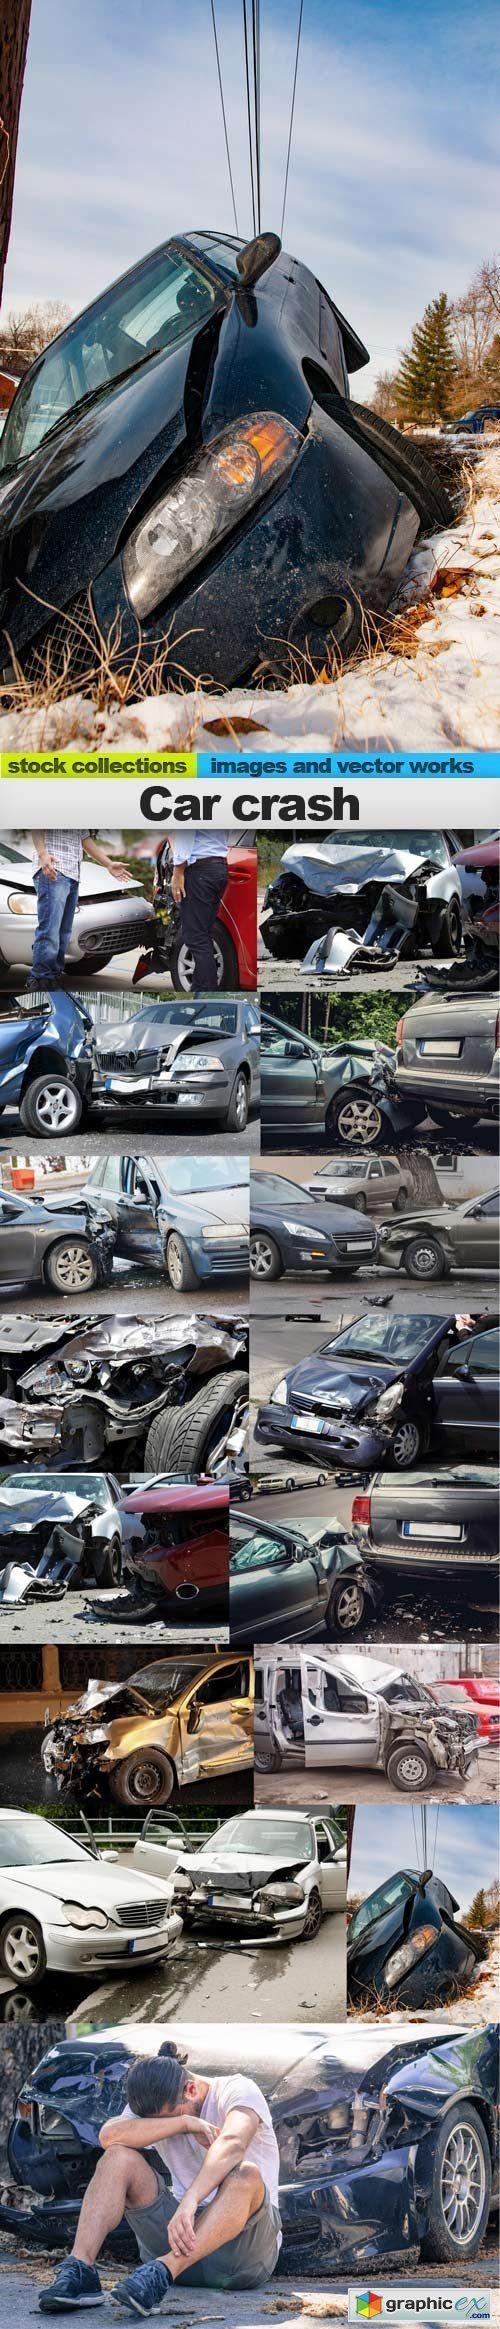 http://graphicex.com/stock-image/stock-verhicles-transport/50282-car-crash-15-x-uhq-jpeg.html